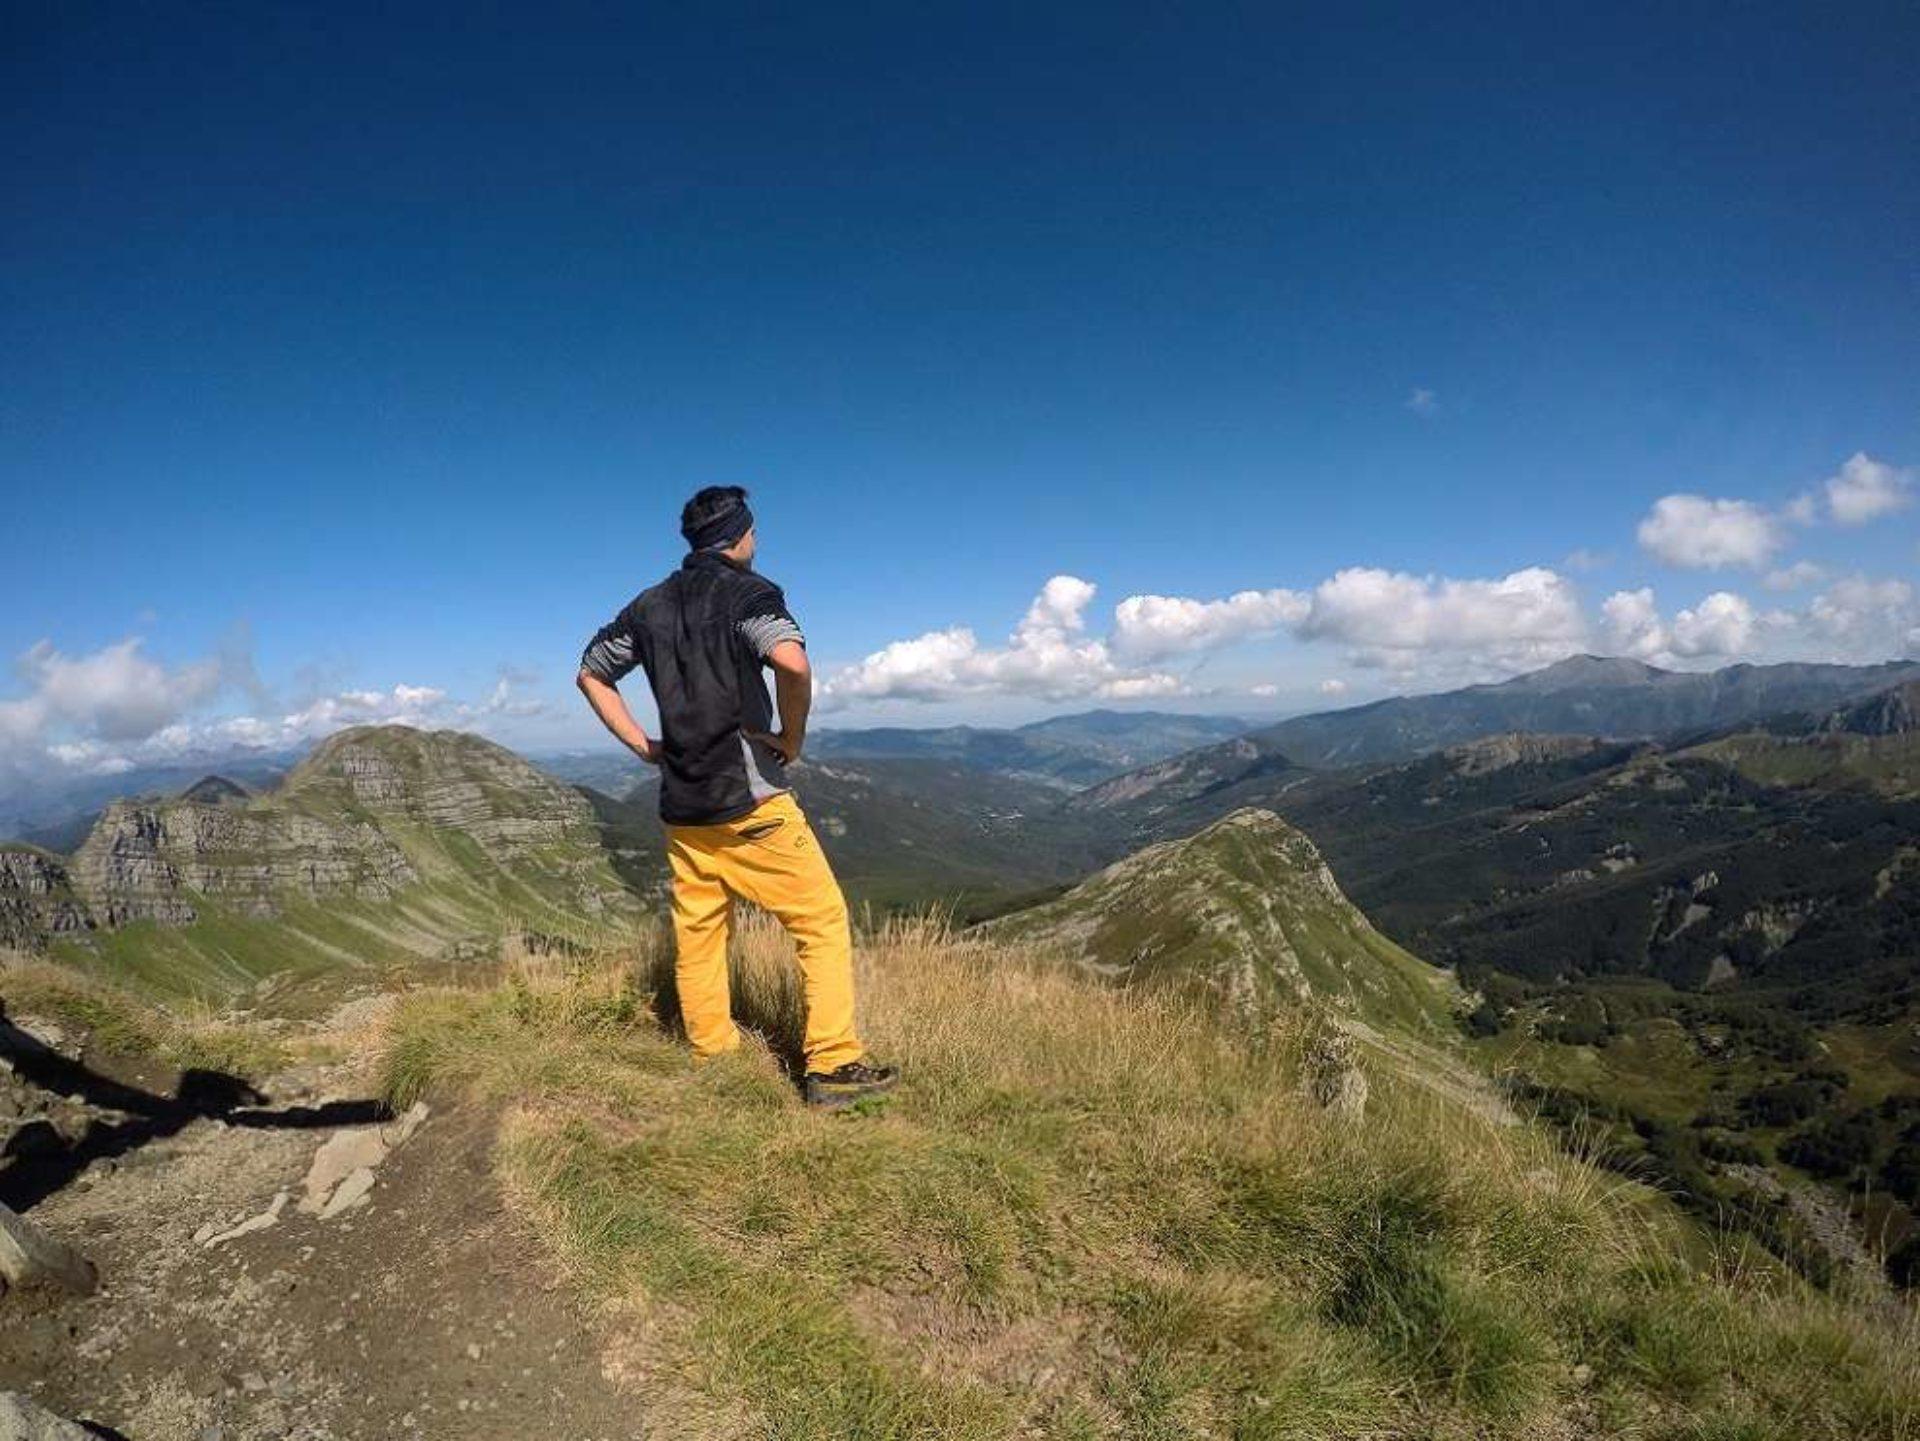 Trekking Pievepelago